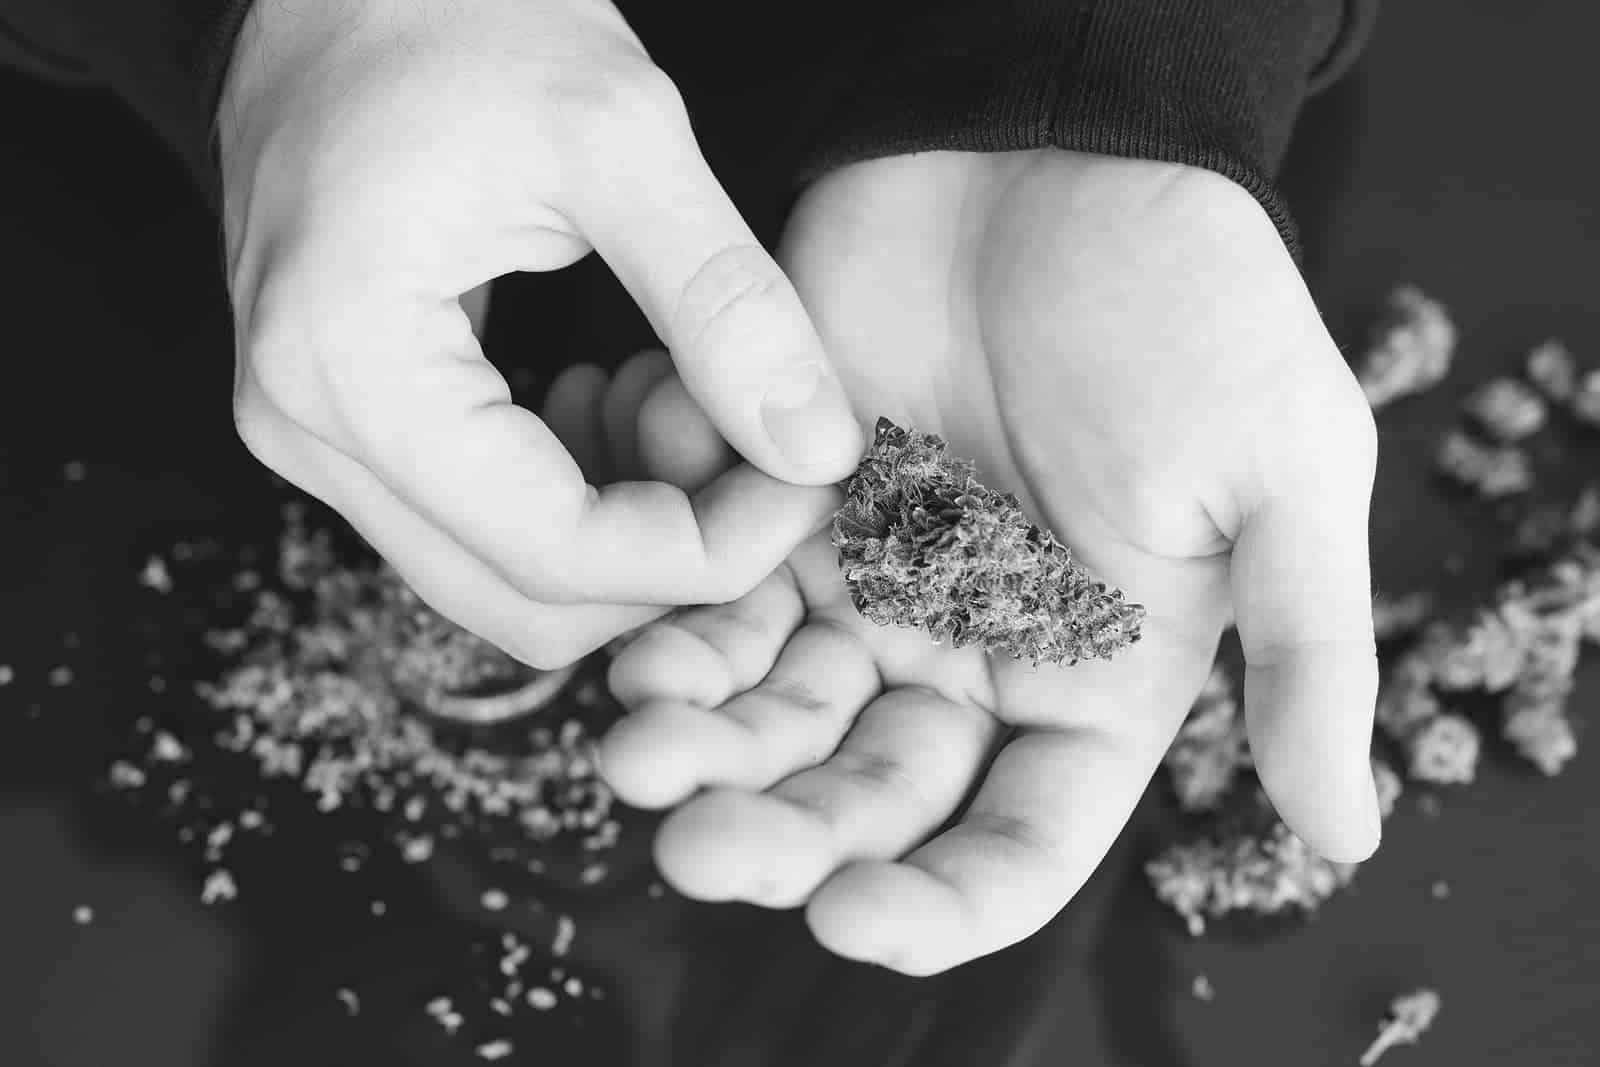 Marijuana Seeds and Strains for Cancer